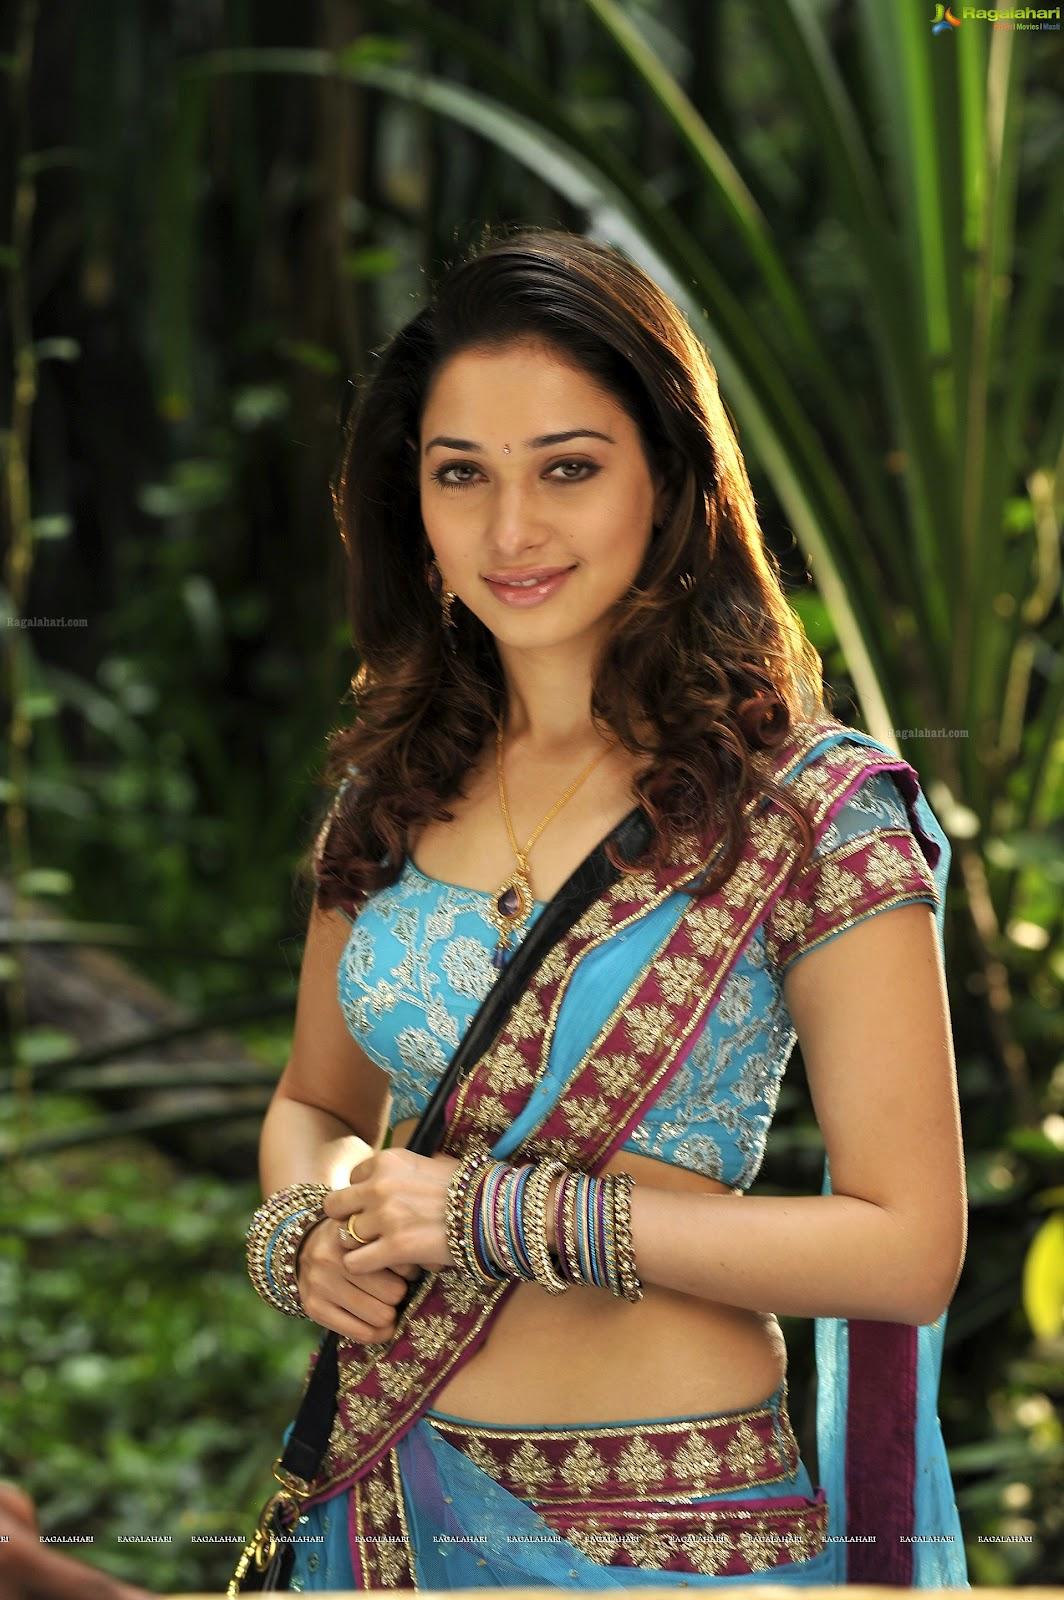 Sexy Hotwhd Tamanna Tamil Actress Hot New Style Photos -5442